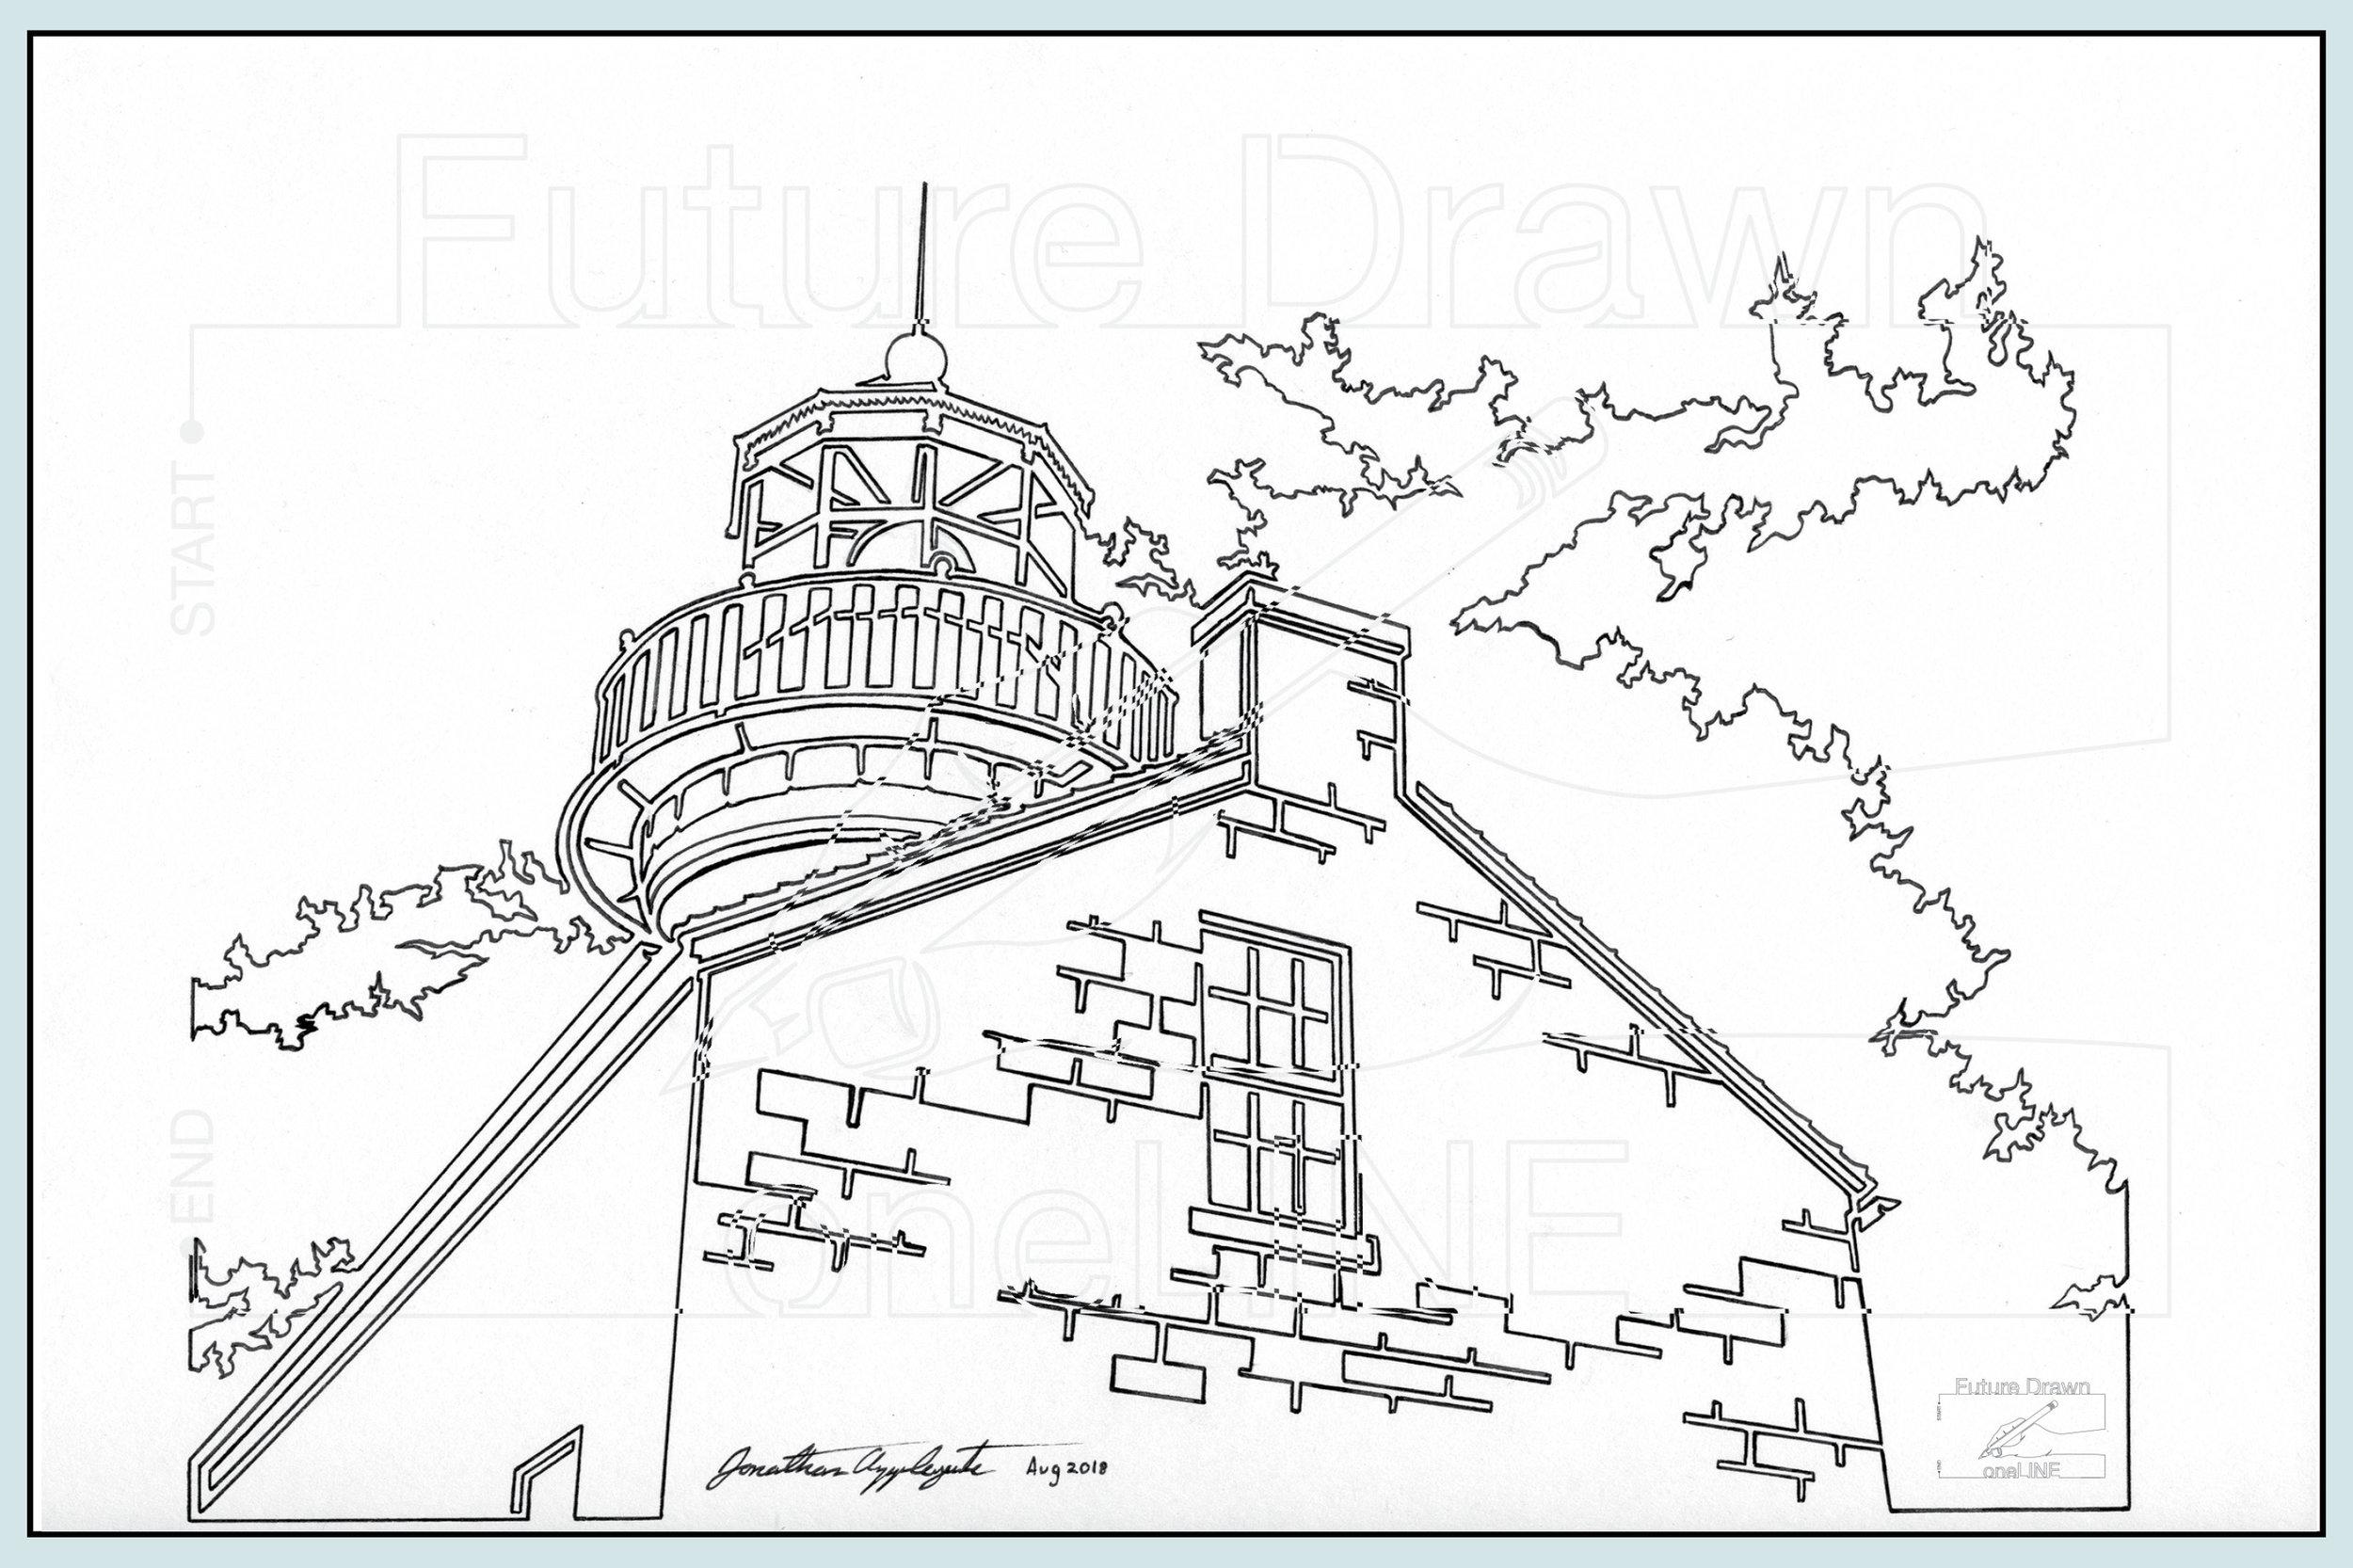 Web- Cabrillo National- oneLINE Future Drawn Applegate.jpg